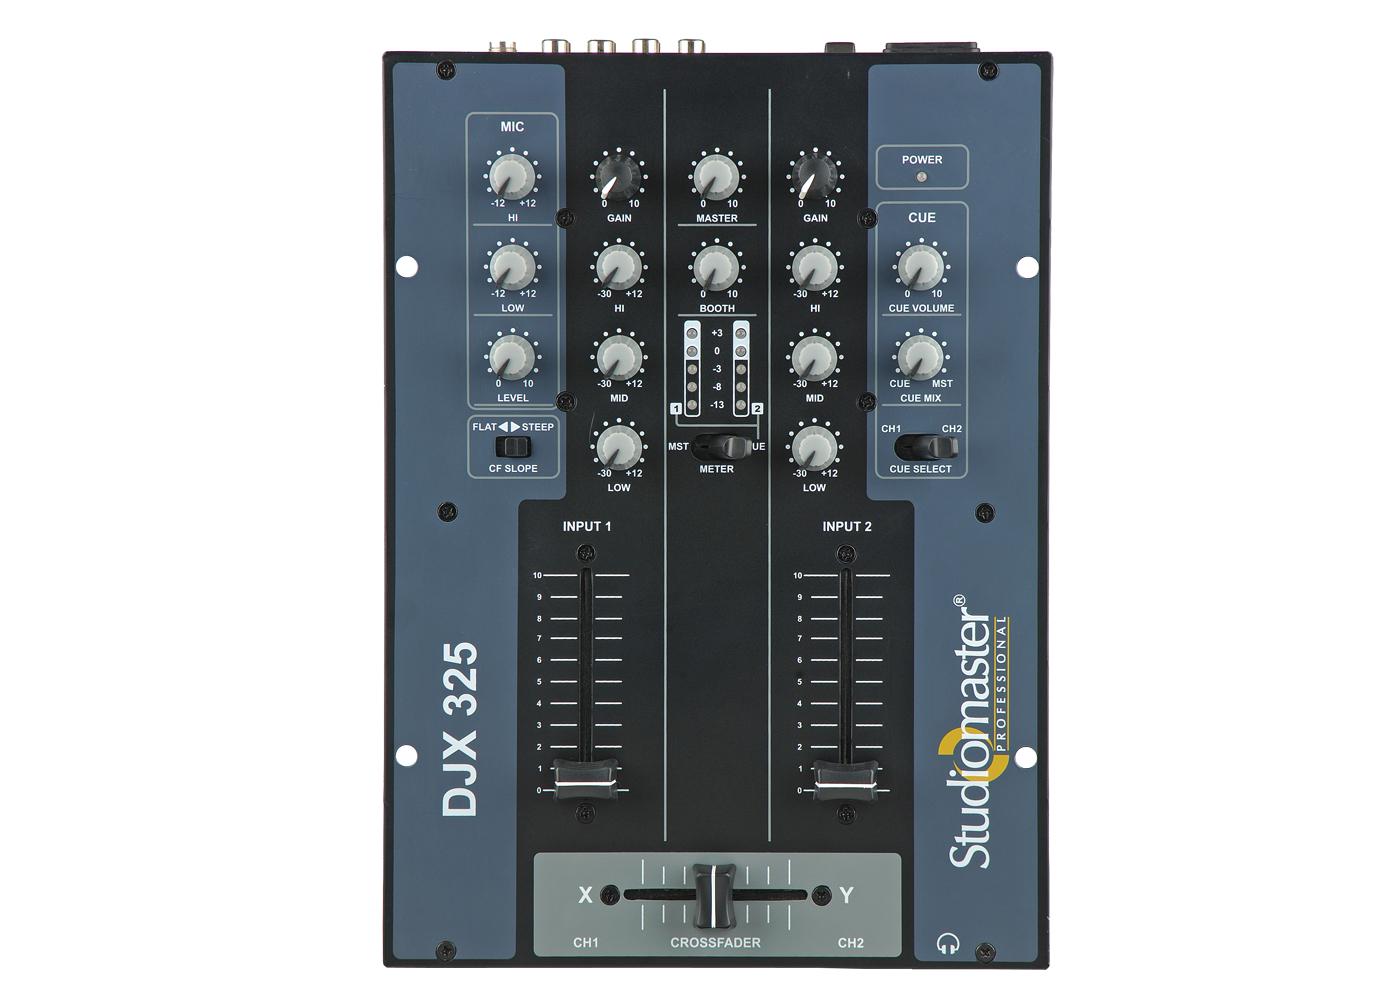 djx-325 3 channel dj mixer by studiomaster Professional.jpg